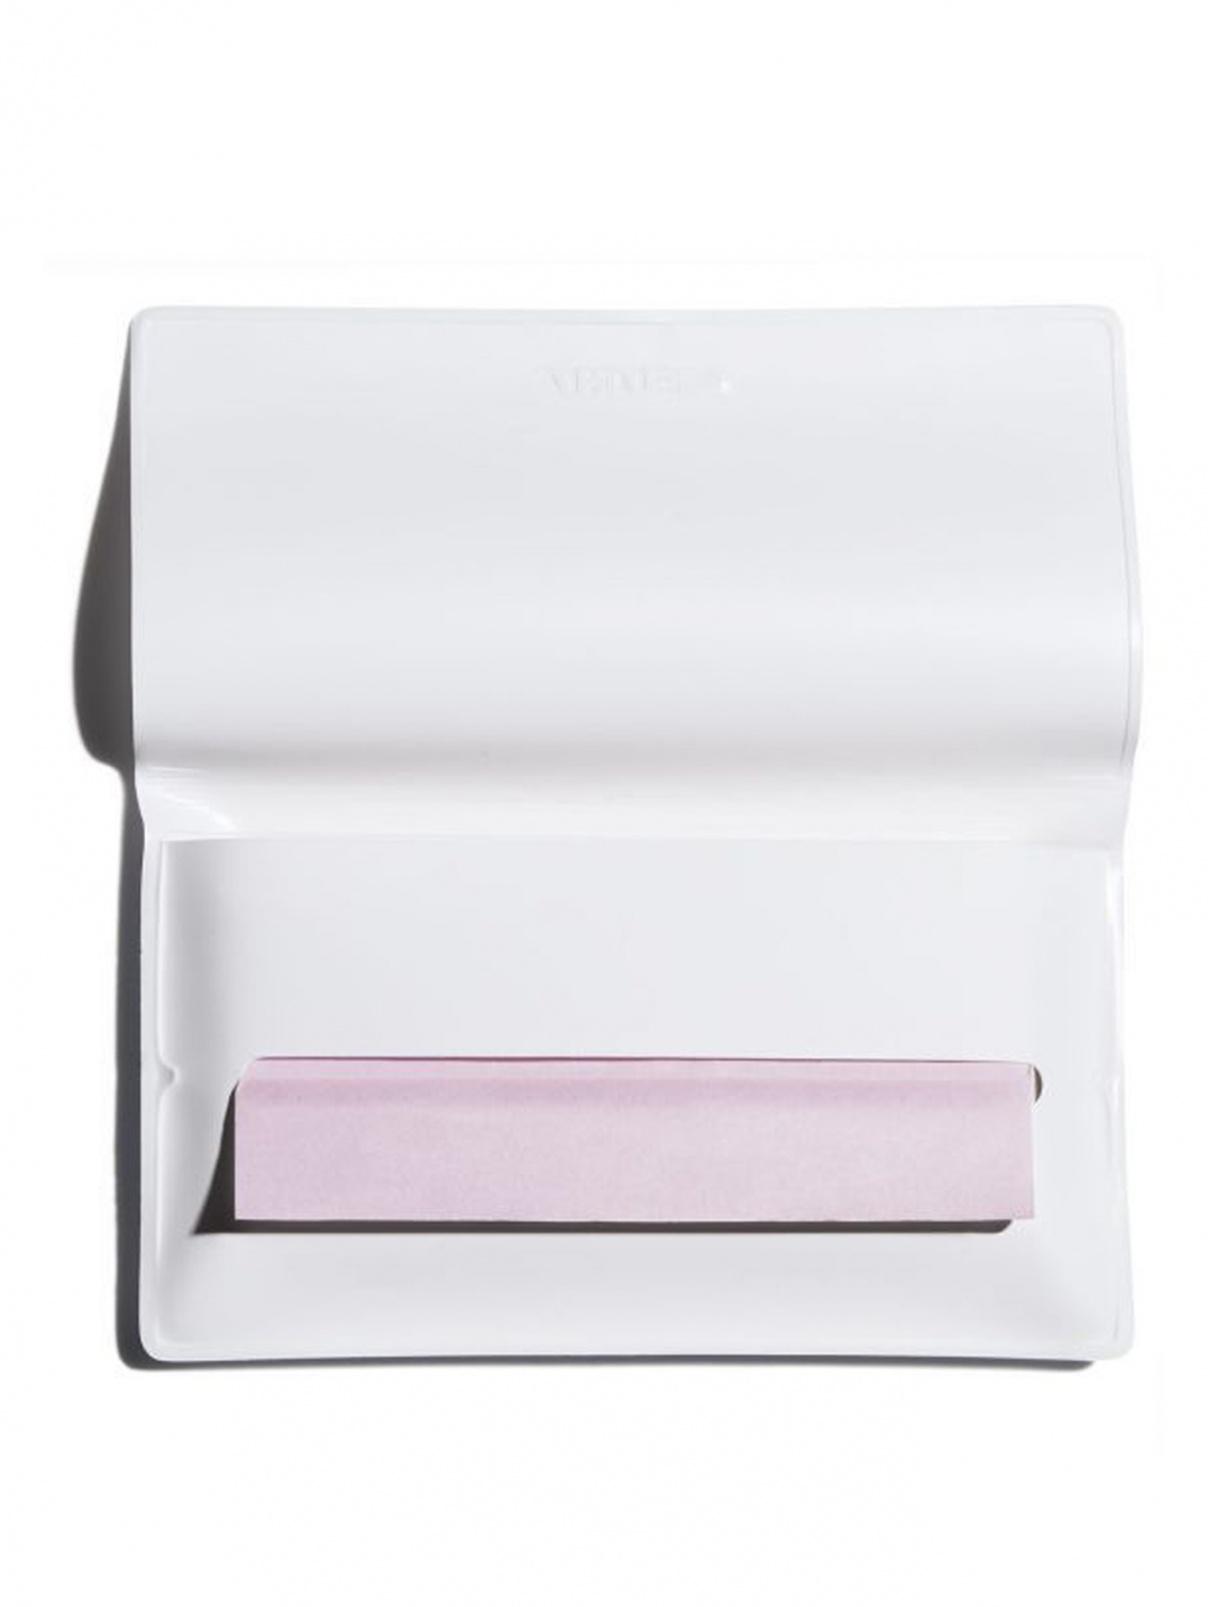 Матирующие салфетки 100 шт Generic Skincare Shiseido  –  Общий вид